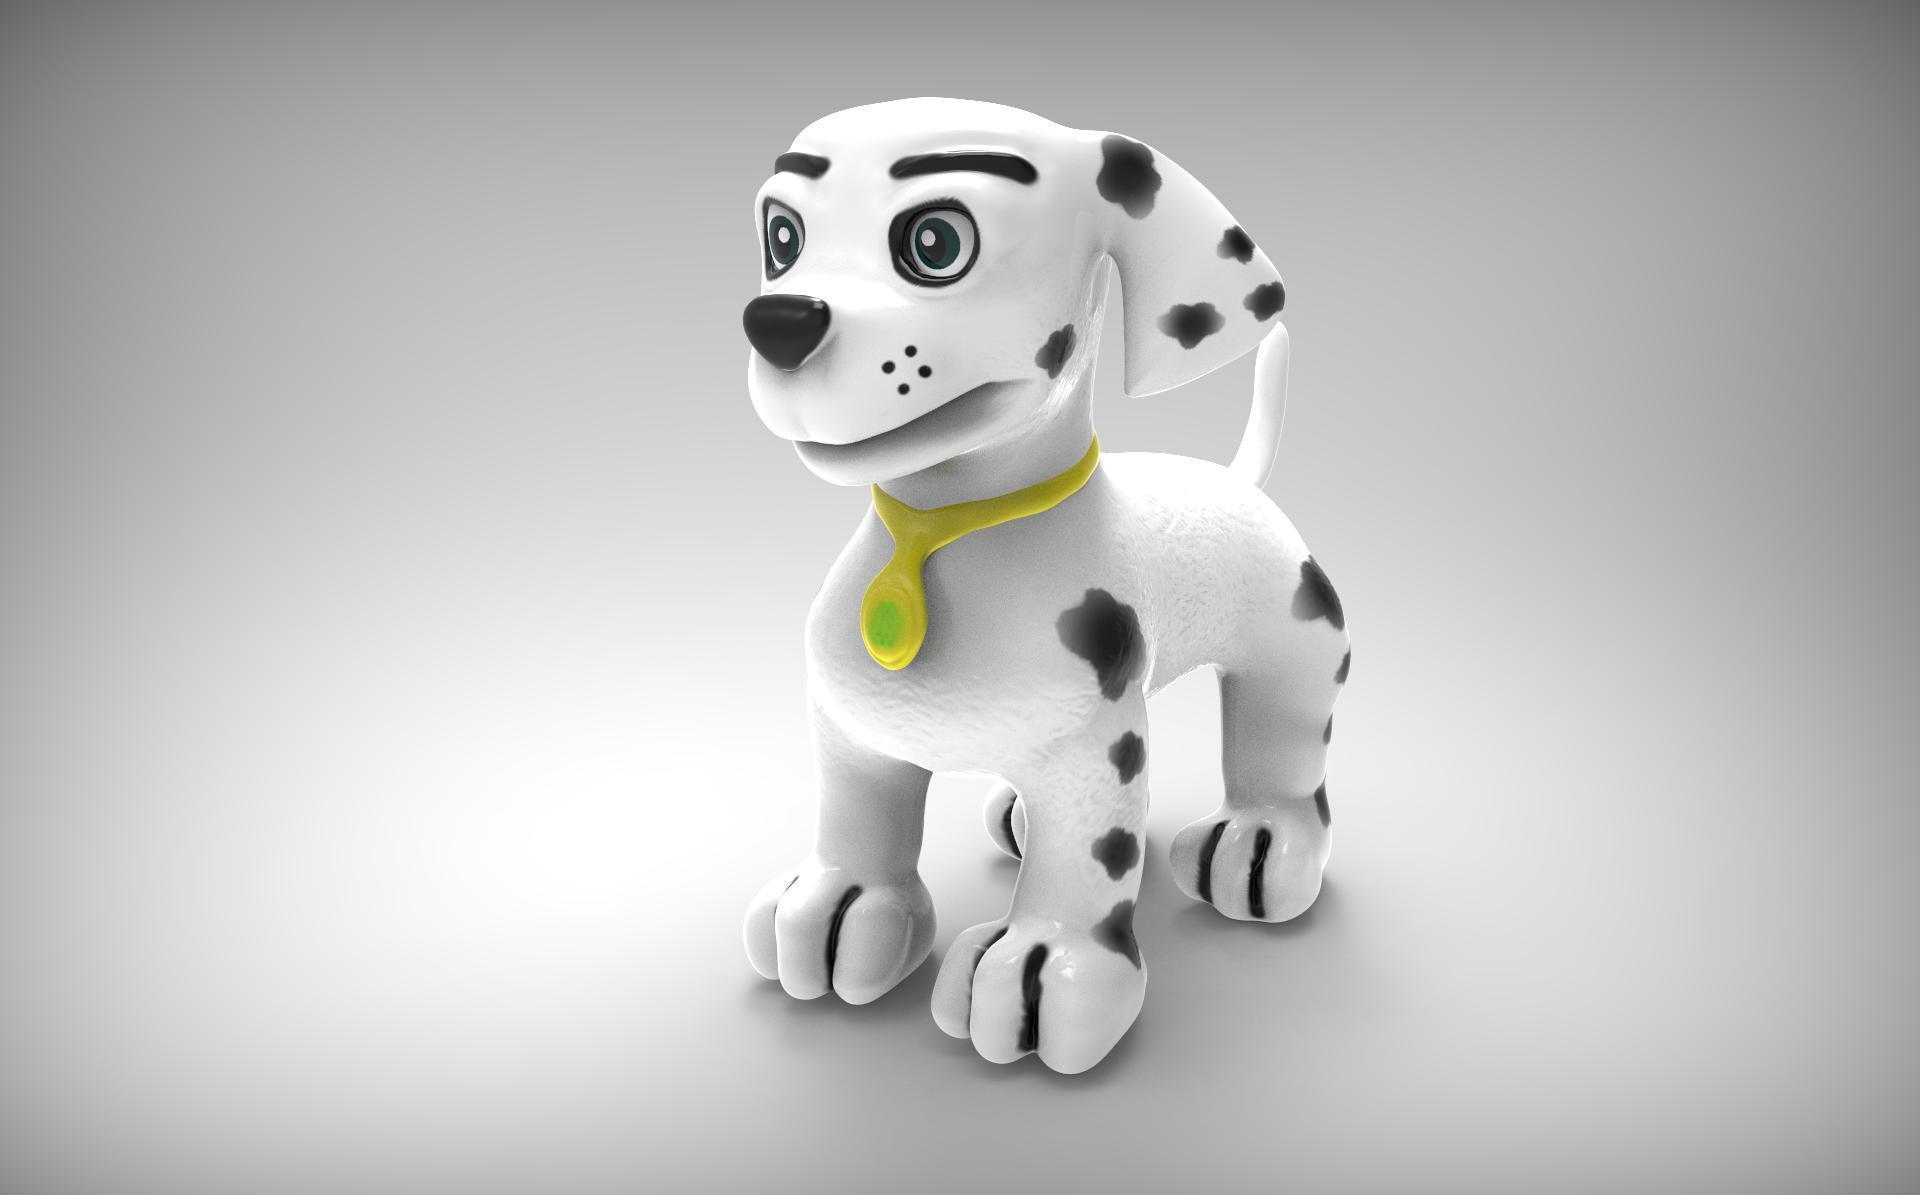 3D Printed Marshall Paw patrol Puppy Dog by XeratDragons  ad0b08aecbdf